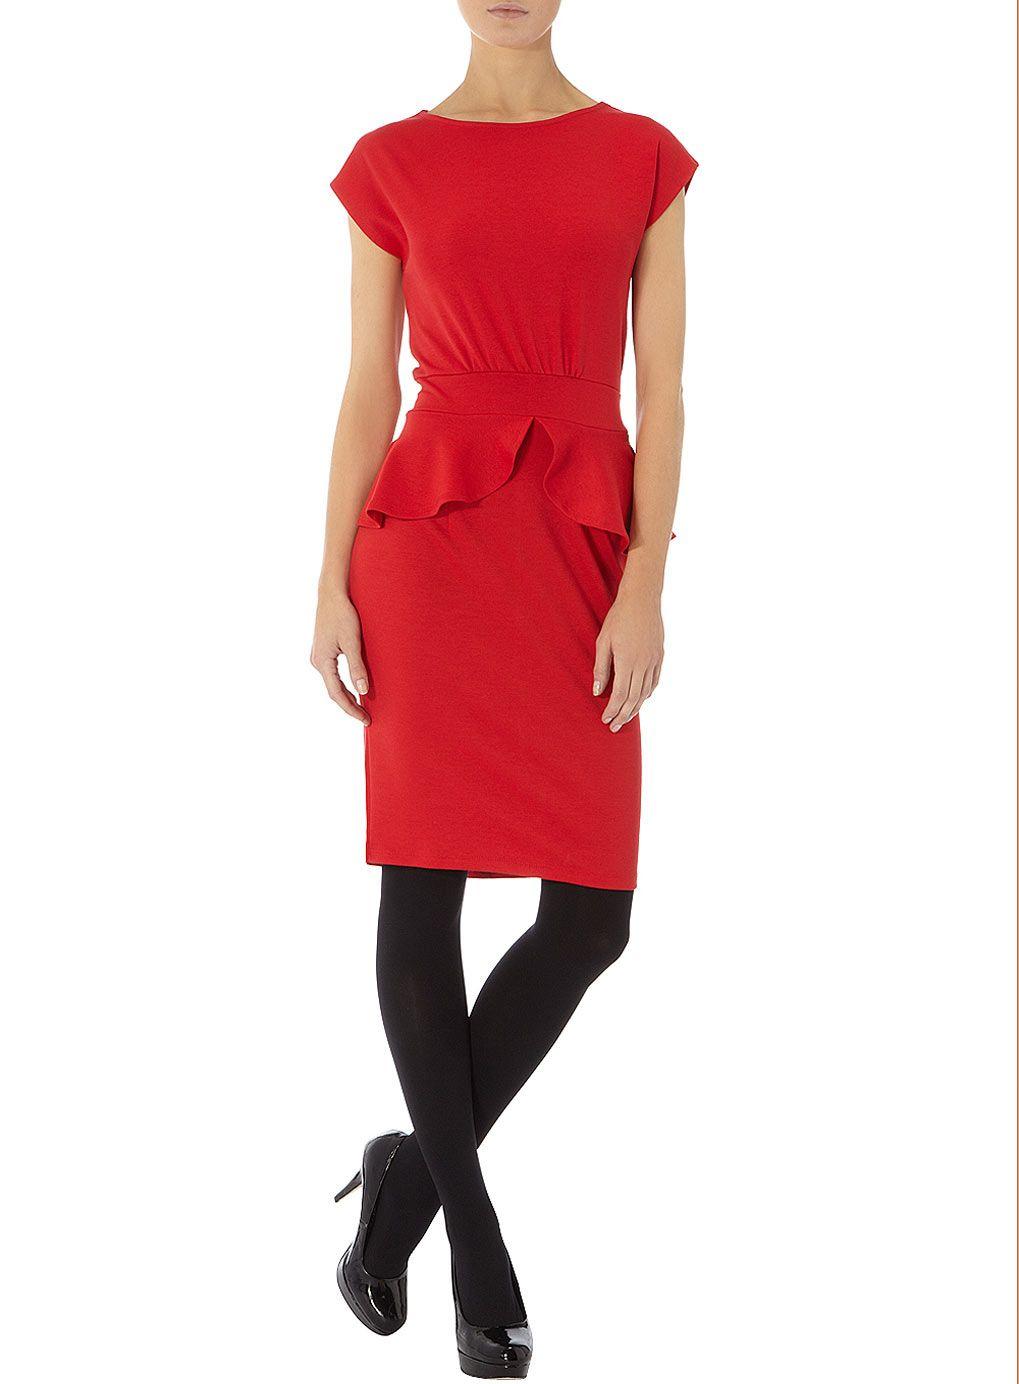 Red ponte peplum dress